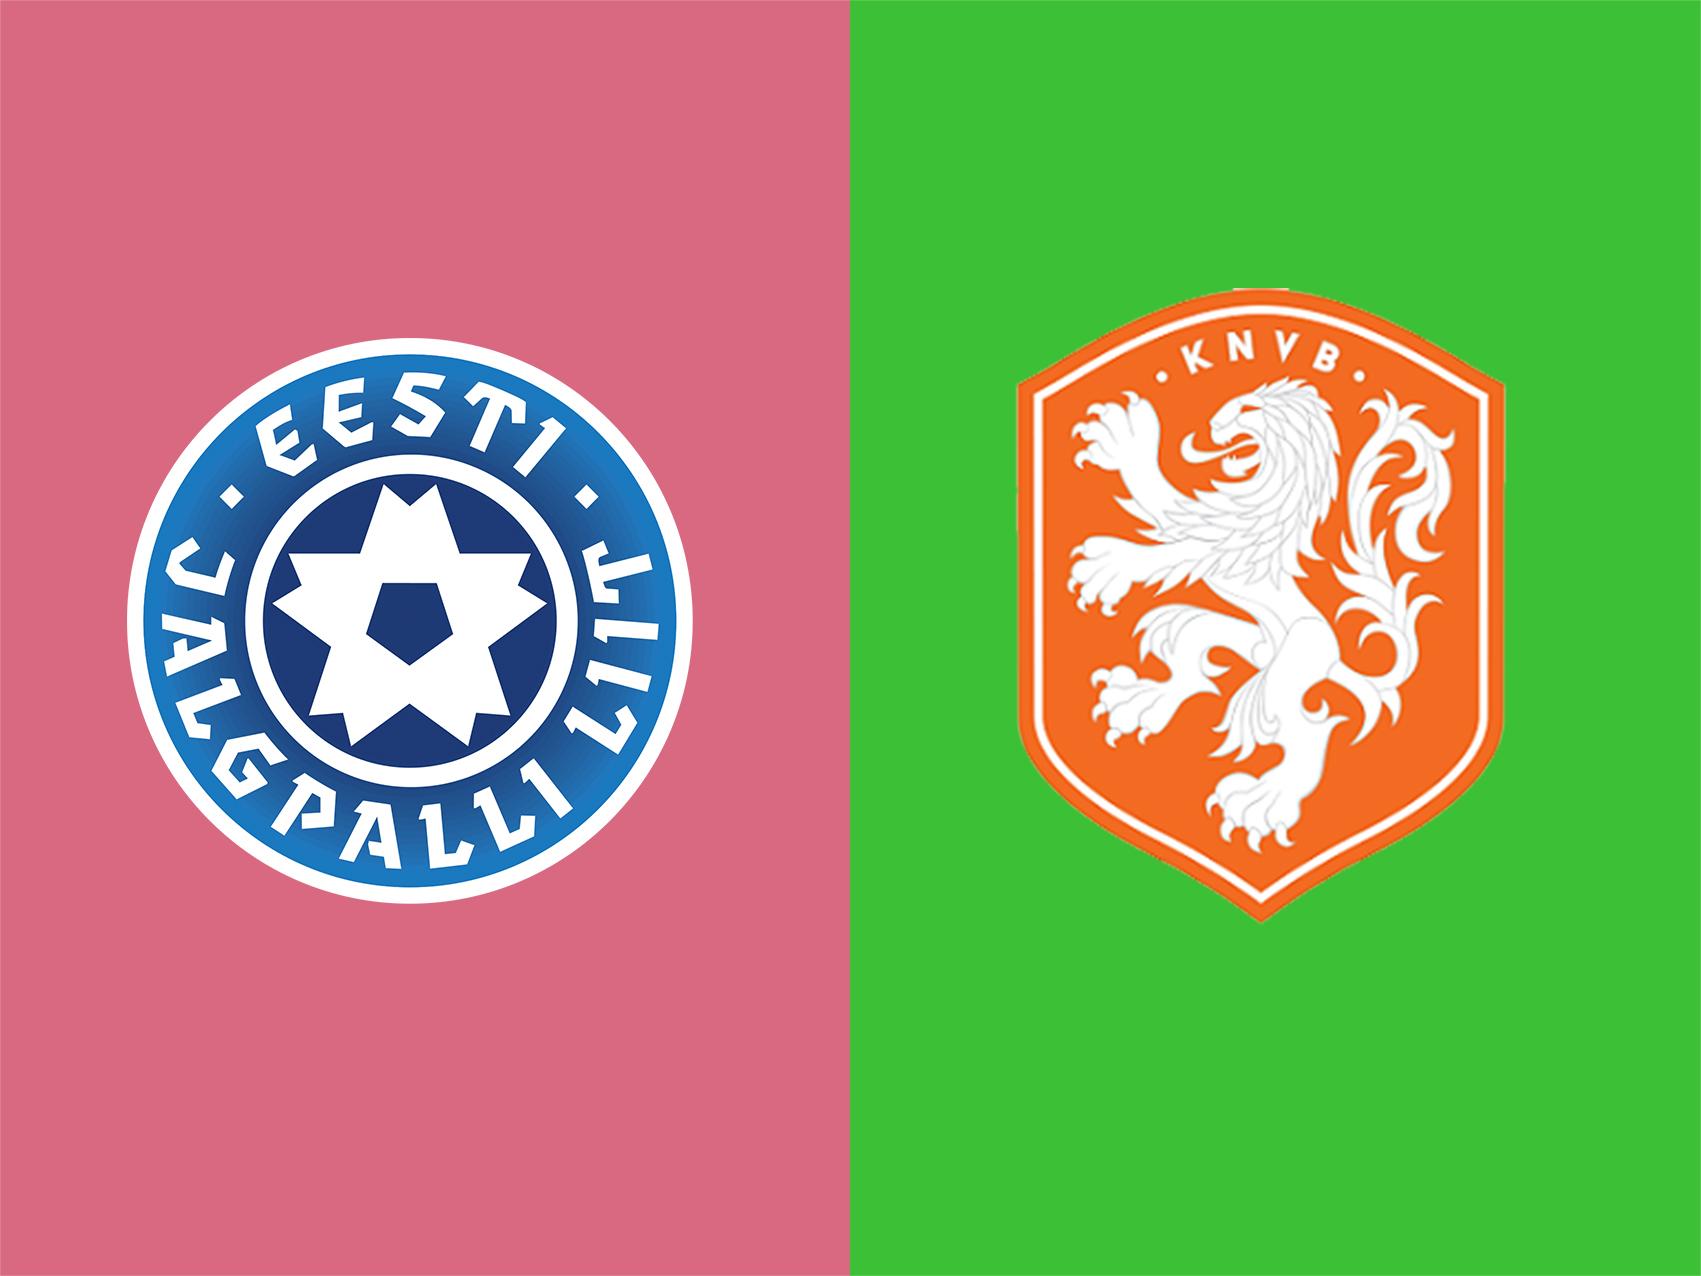 soi-keo-ca-cuoc-bong-da-ngay-10-9-estonia-vs-ha-lan-vui-dap-nhuoc-tieu-b9 1